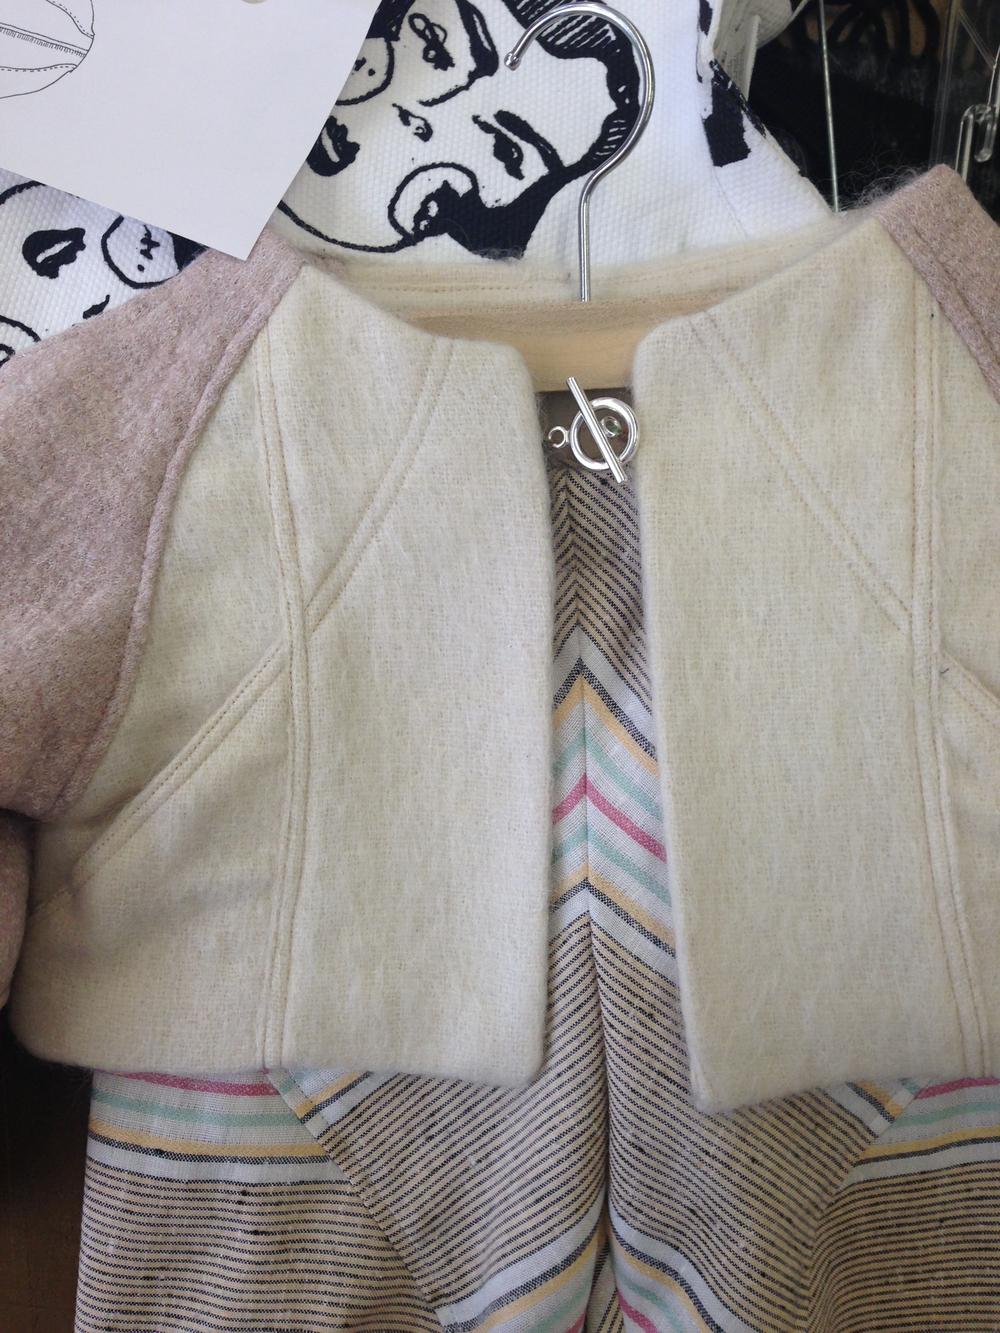 Duck Print Lined Jacket & Chevron Pants . 2015. Wool, linen, silk. Ryerson Univeristy, Toronto.  Background print:  Mifi Mifi